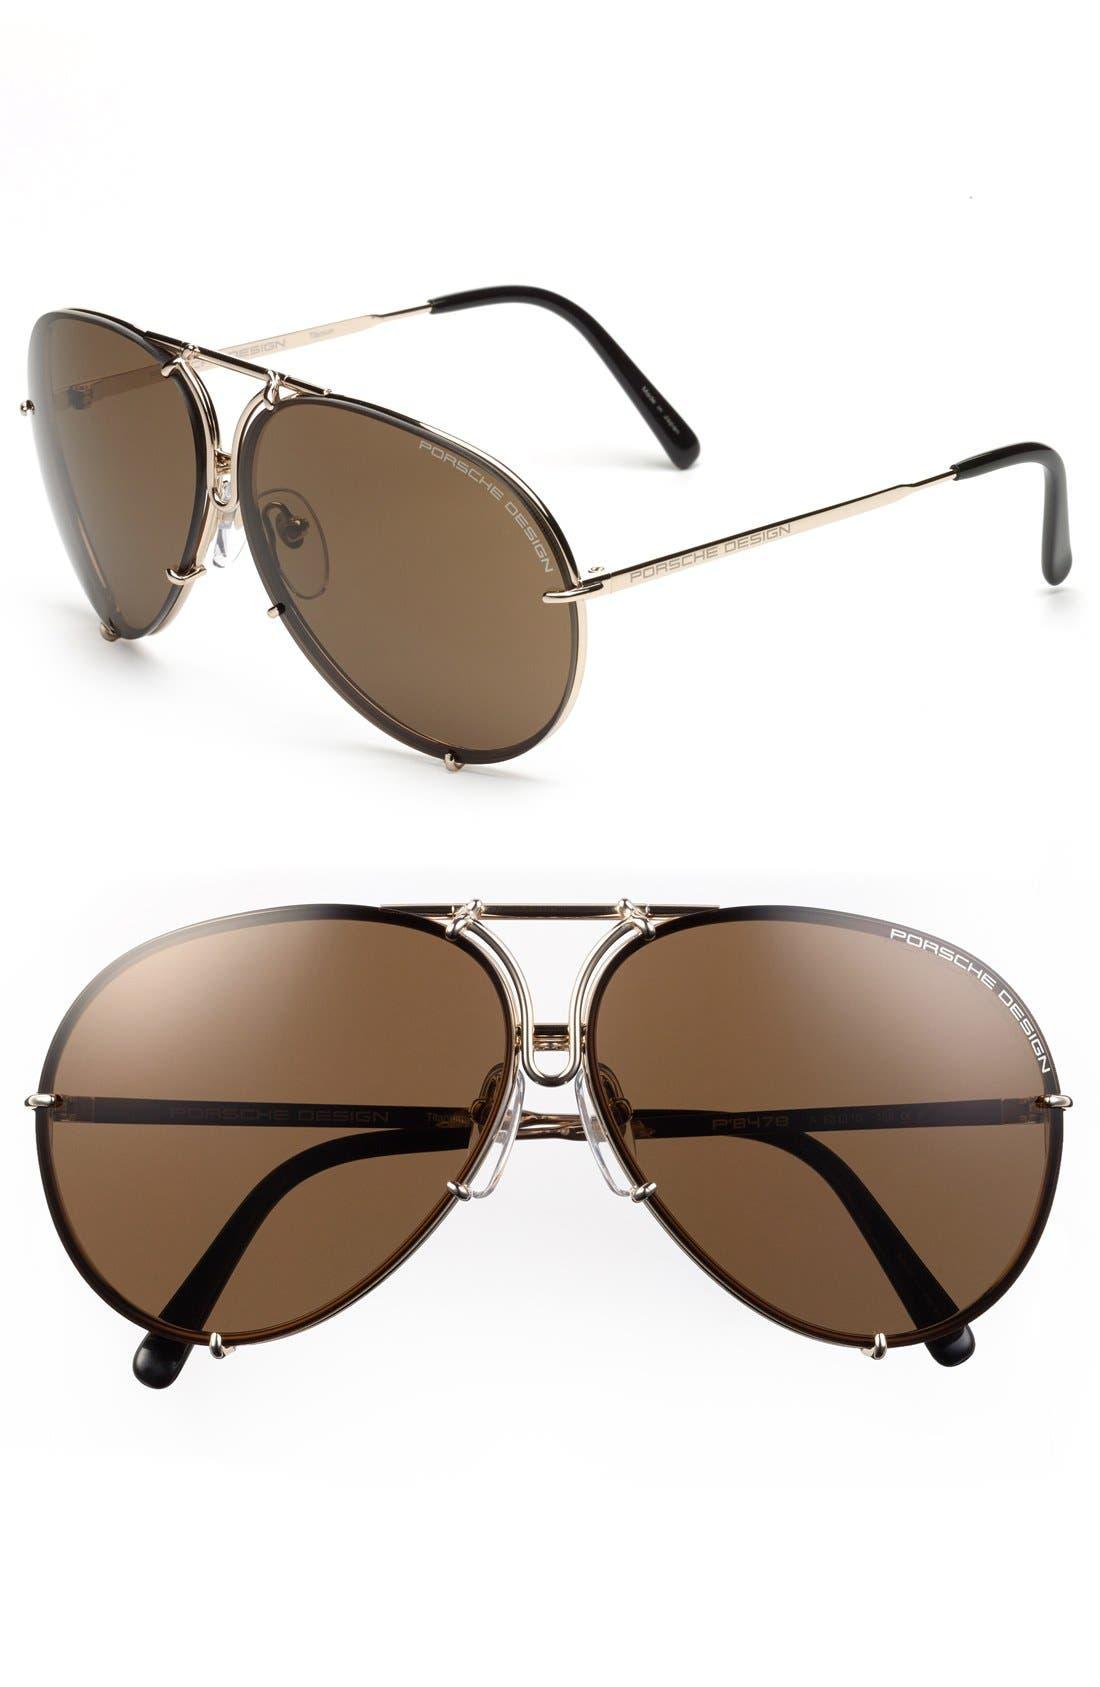 PORSCHE DESIGN 'P8478' 63mm Aviator Sunglasses